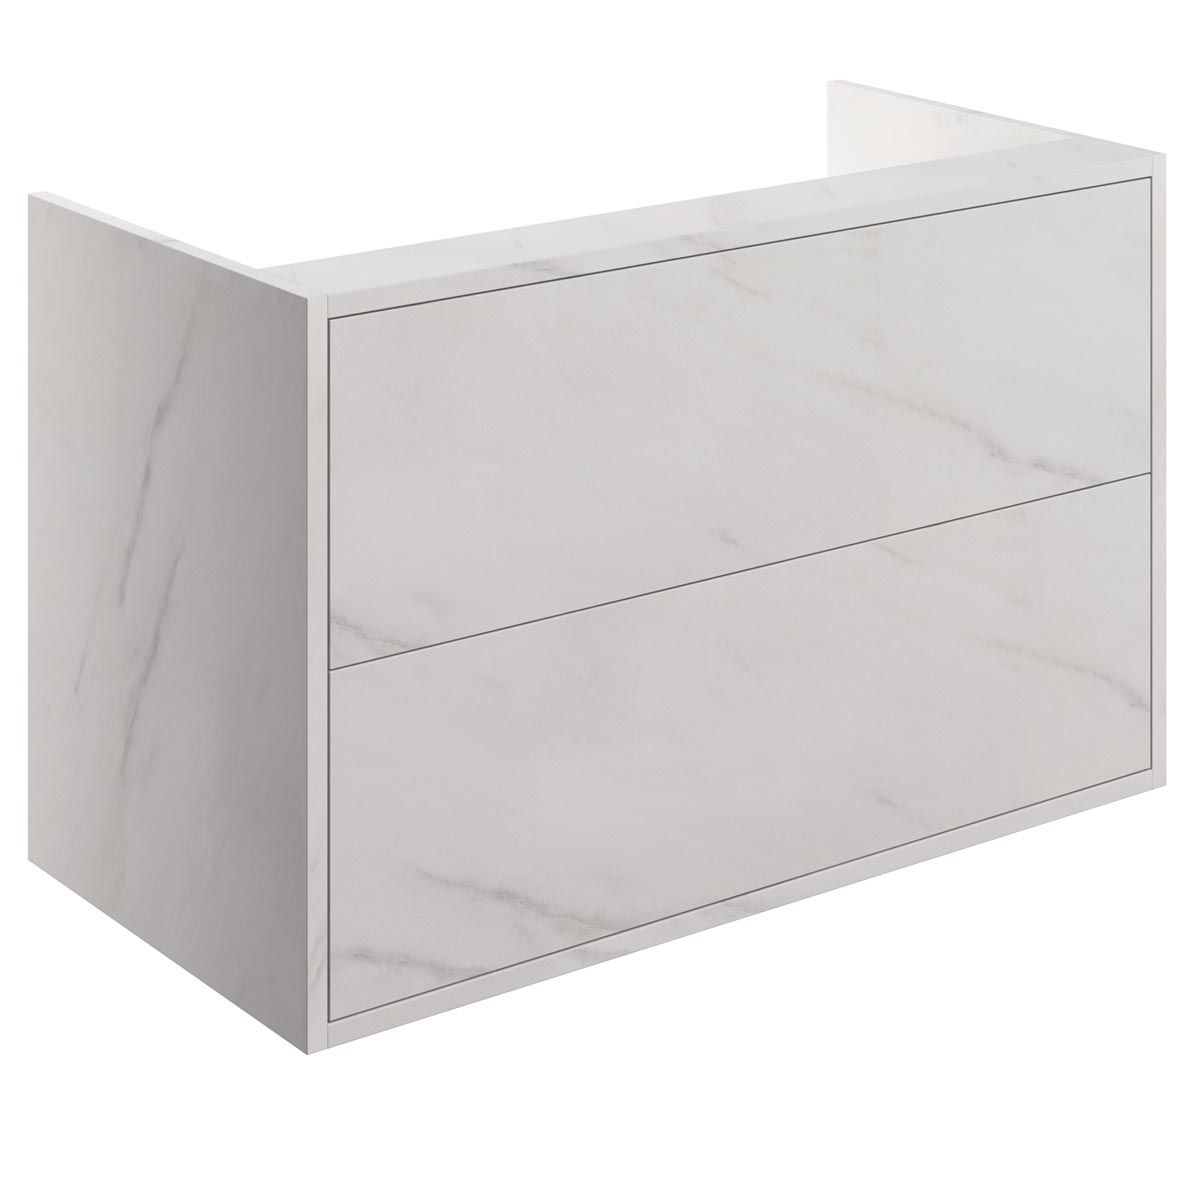 BTL Perla Marble 2 Drawer Vanity Unit 900mm